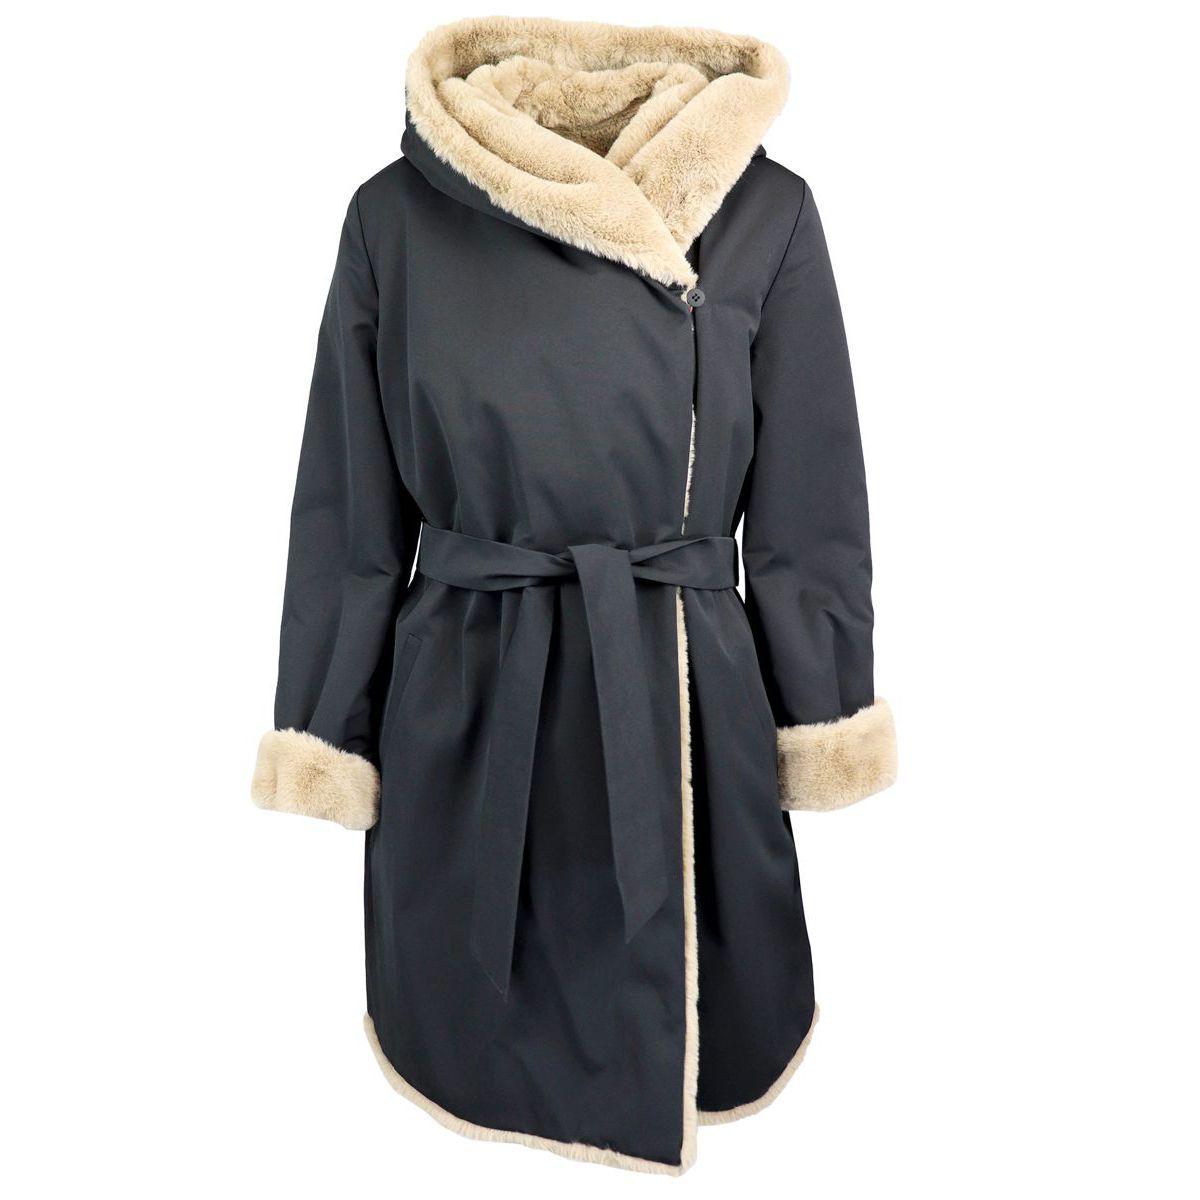 GATTO double coat Black / beige Max Mara